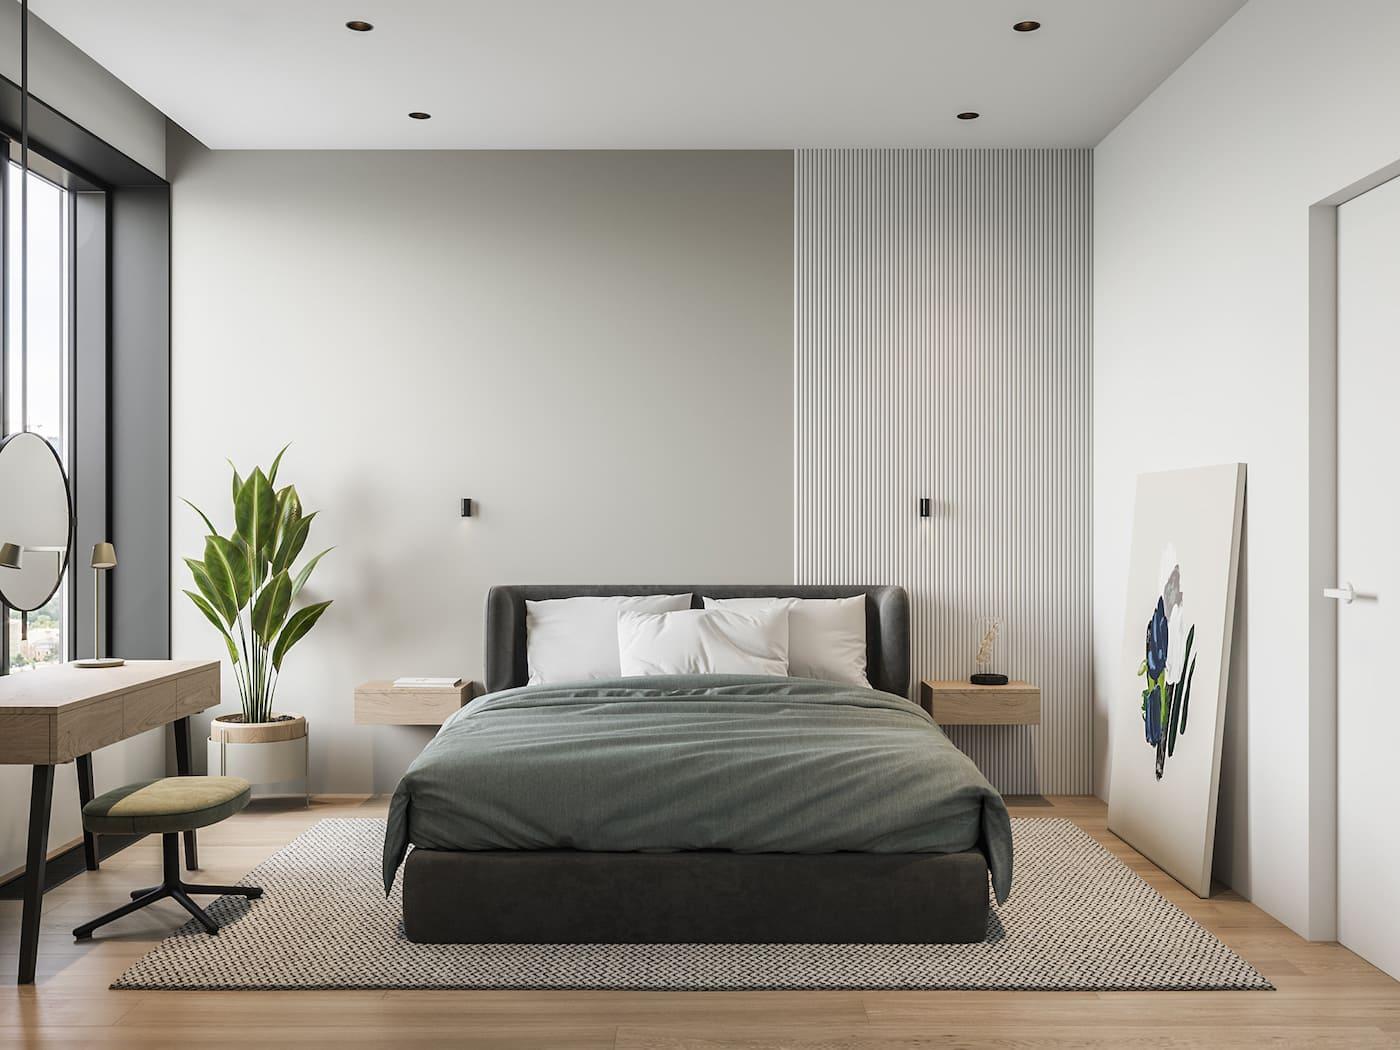 дизайн интерьера модной квартиры фото 50